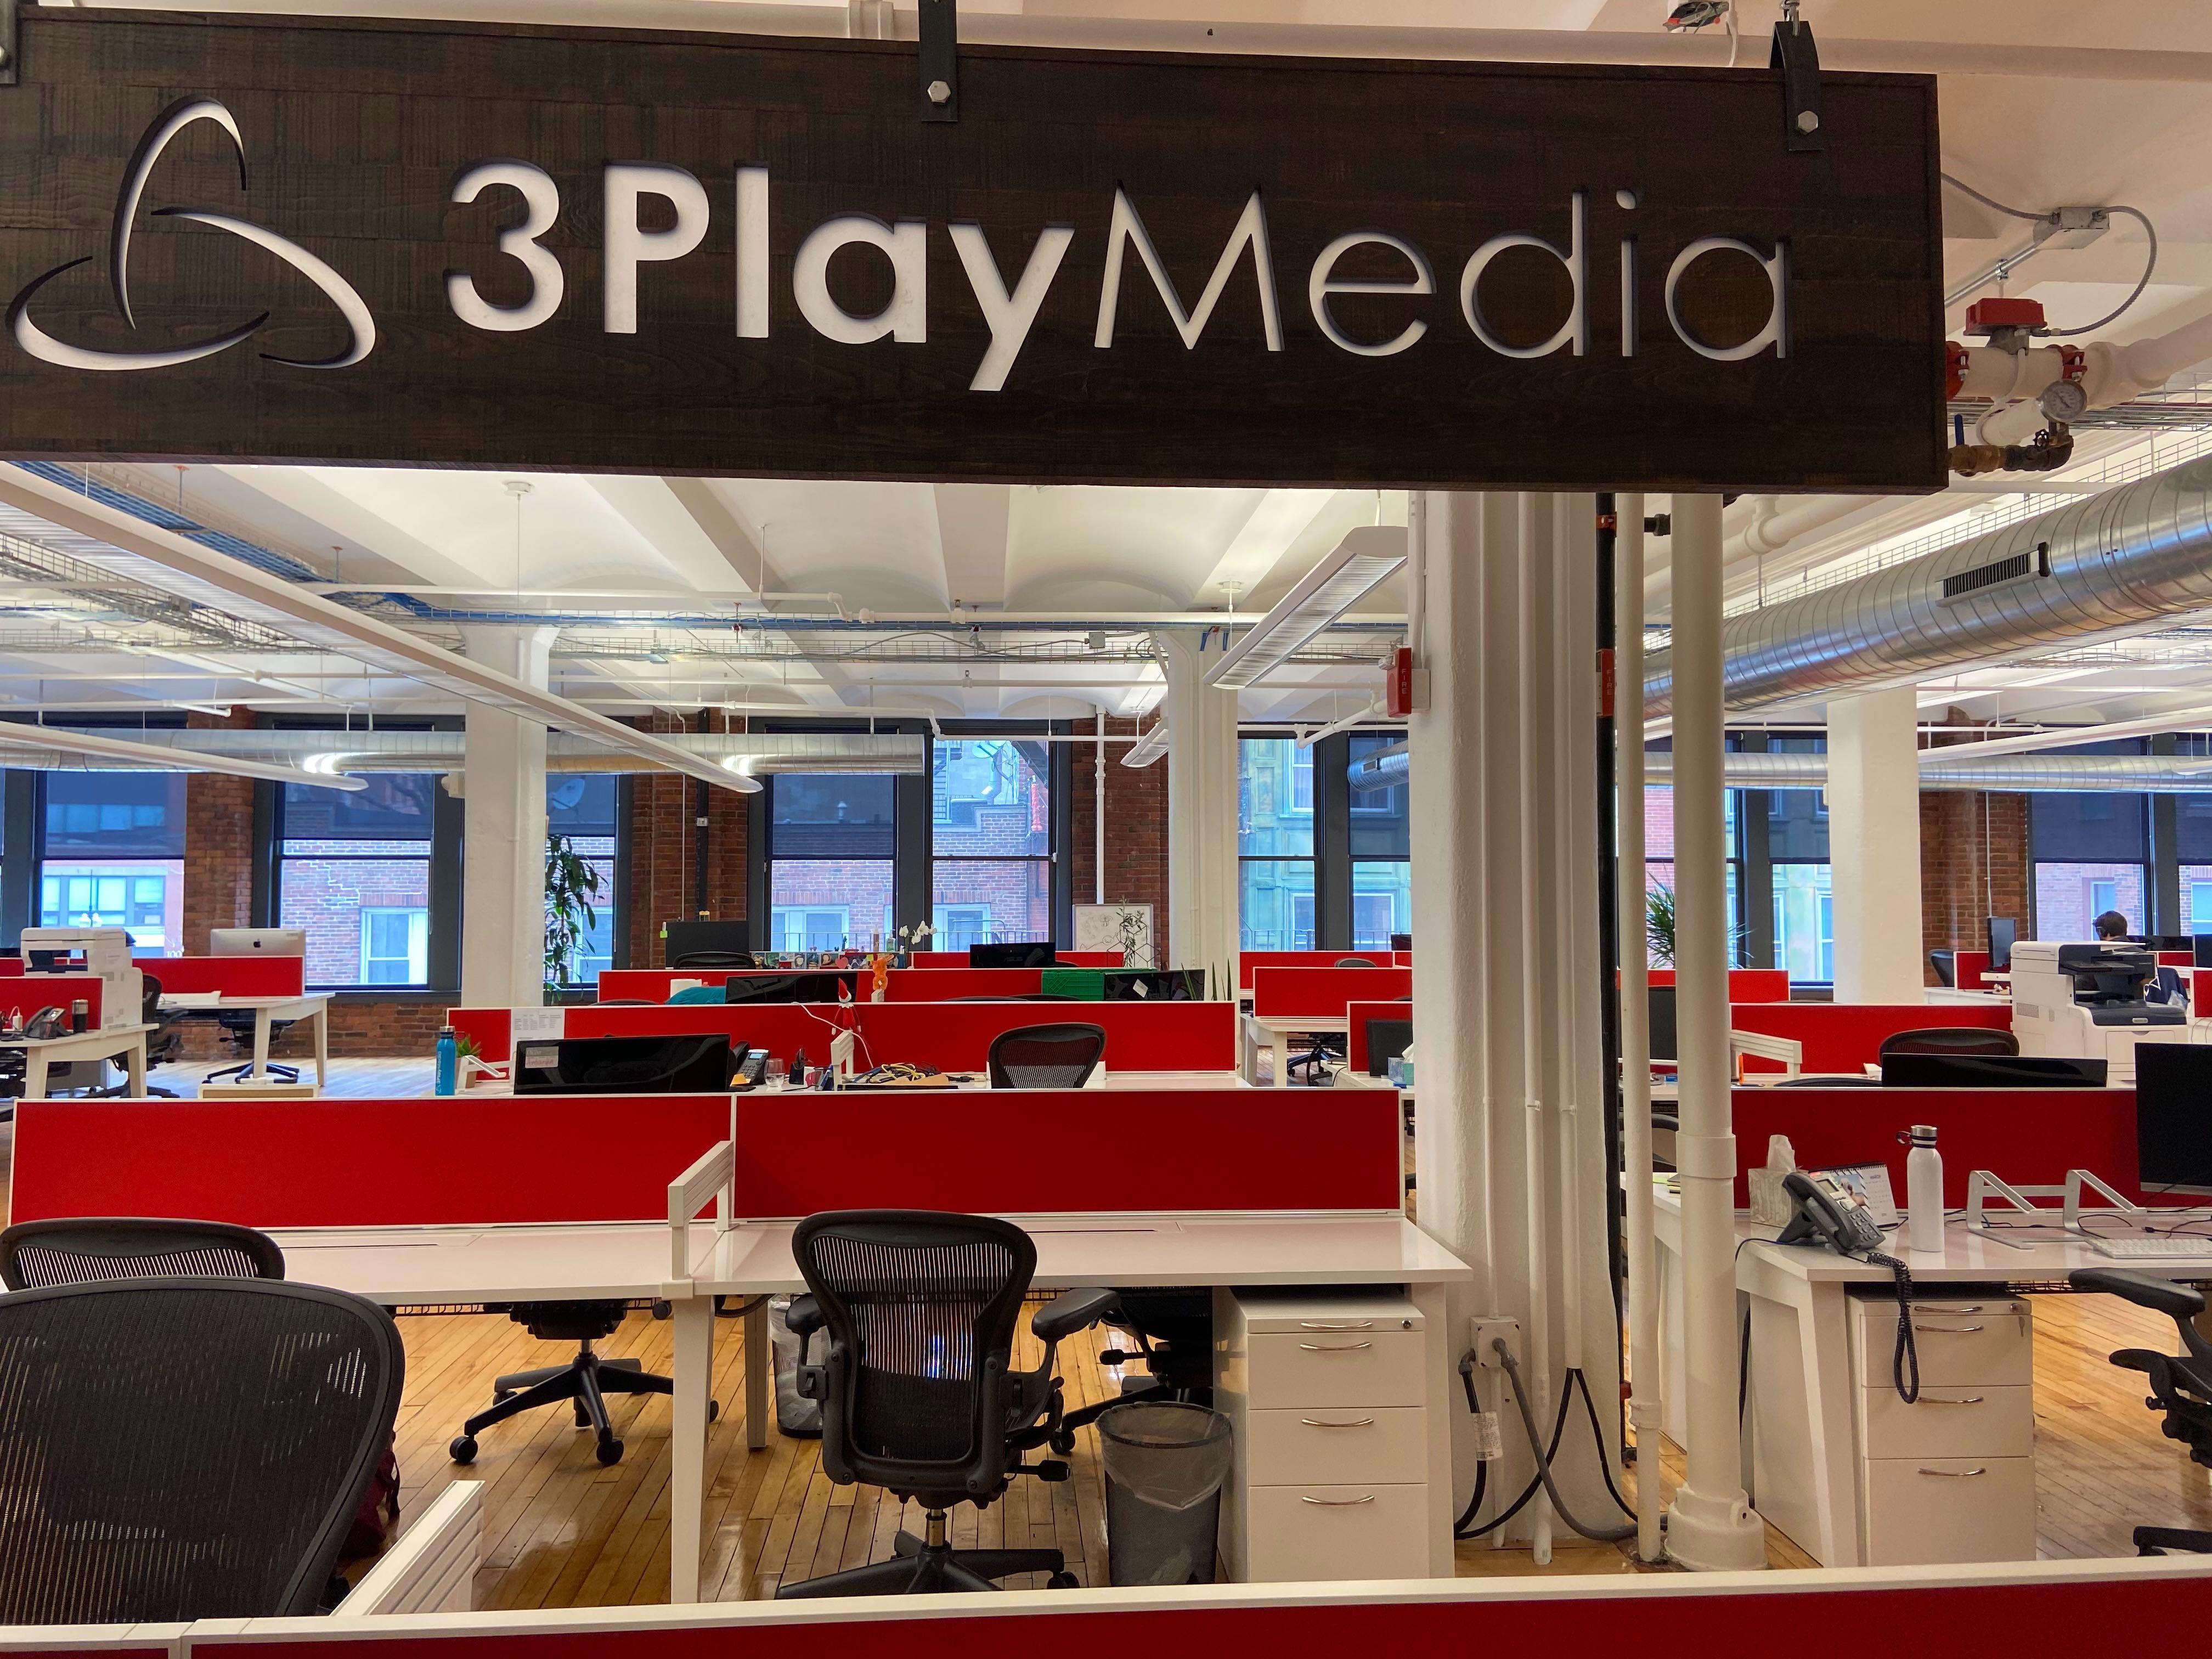 3Play Media sign in the new office on N Washington Street, Boston.